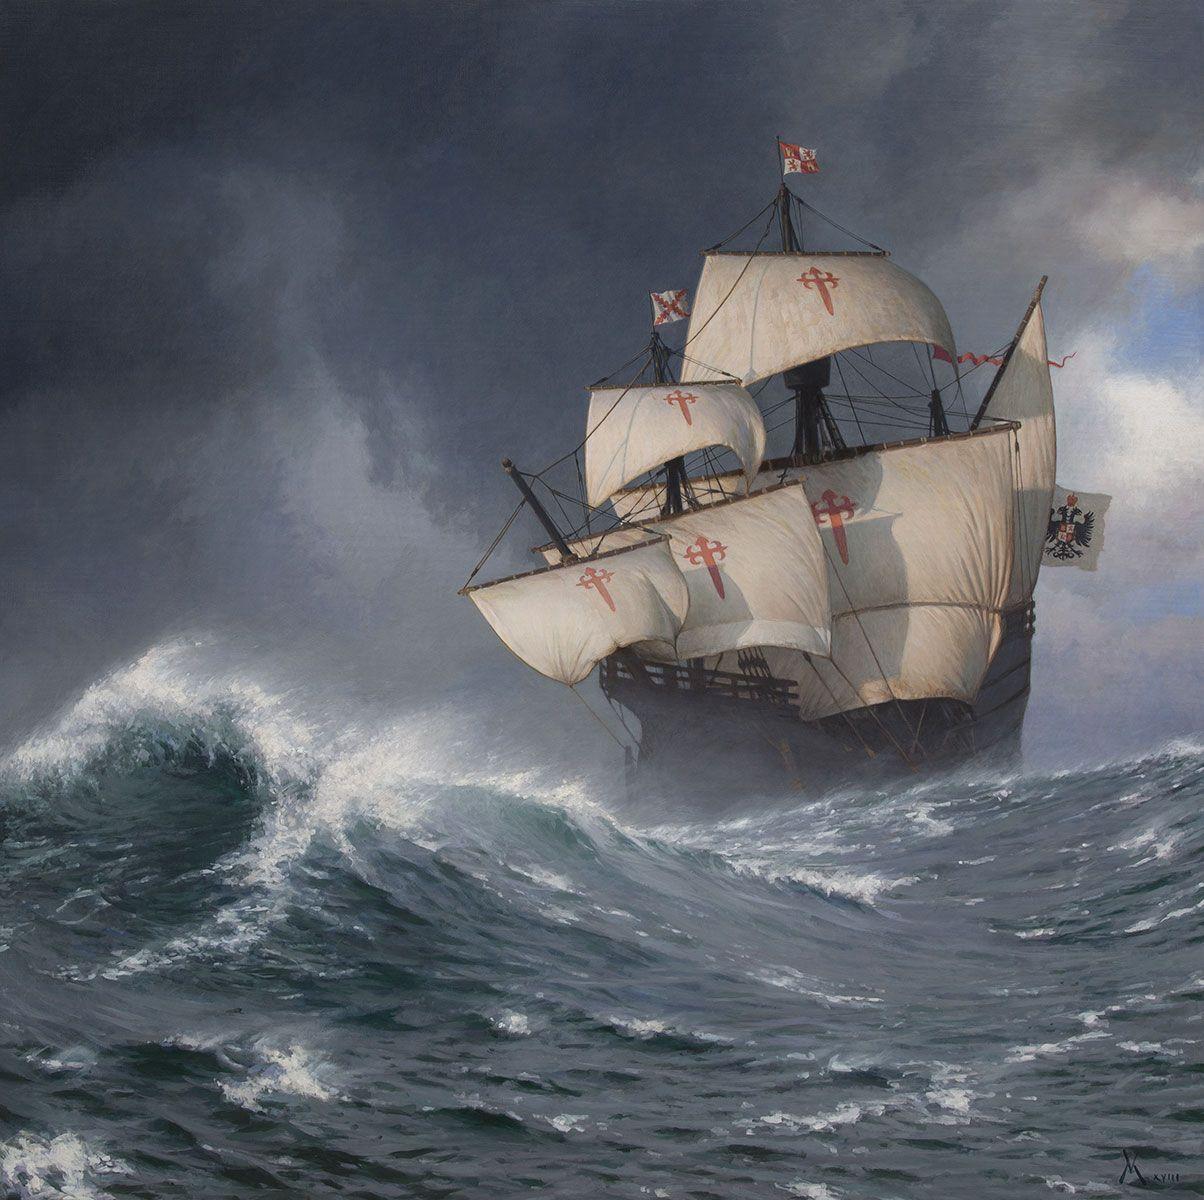 Nao Victoria in the South Seas-Guillermo Munoz